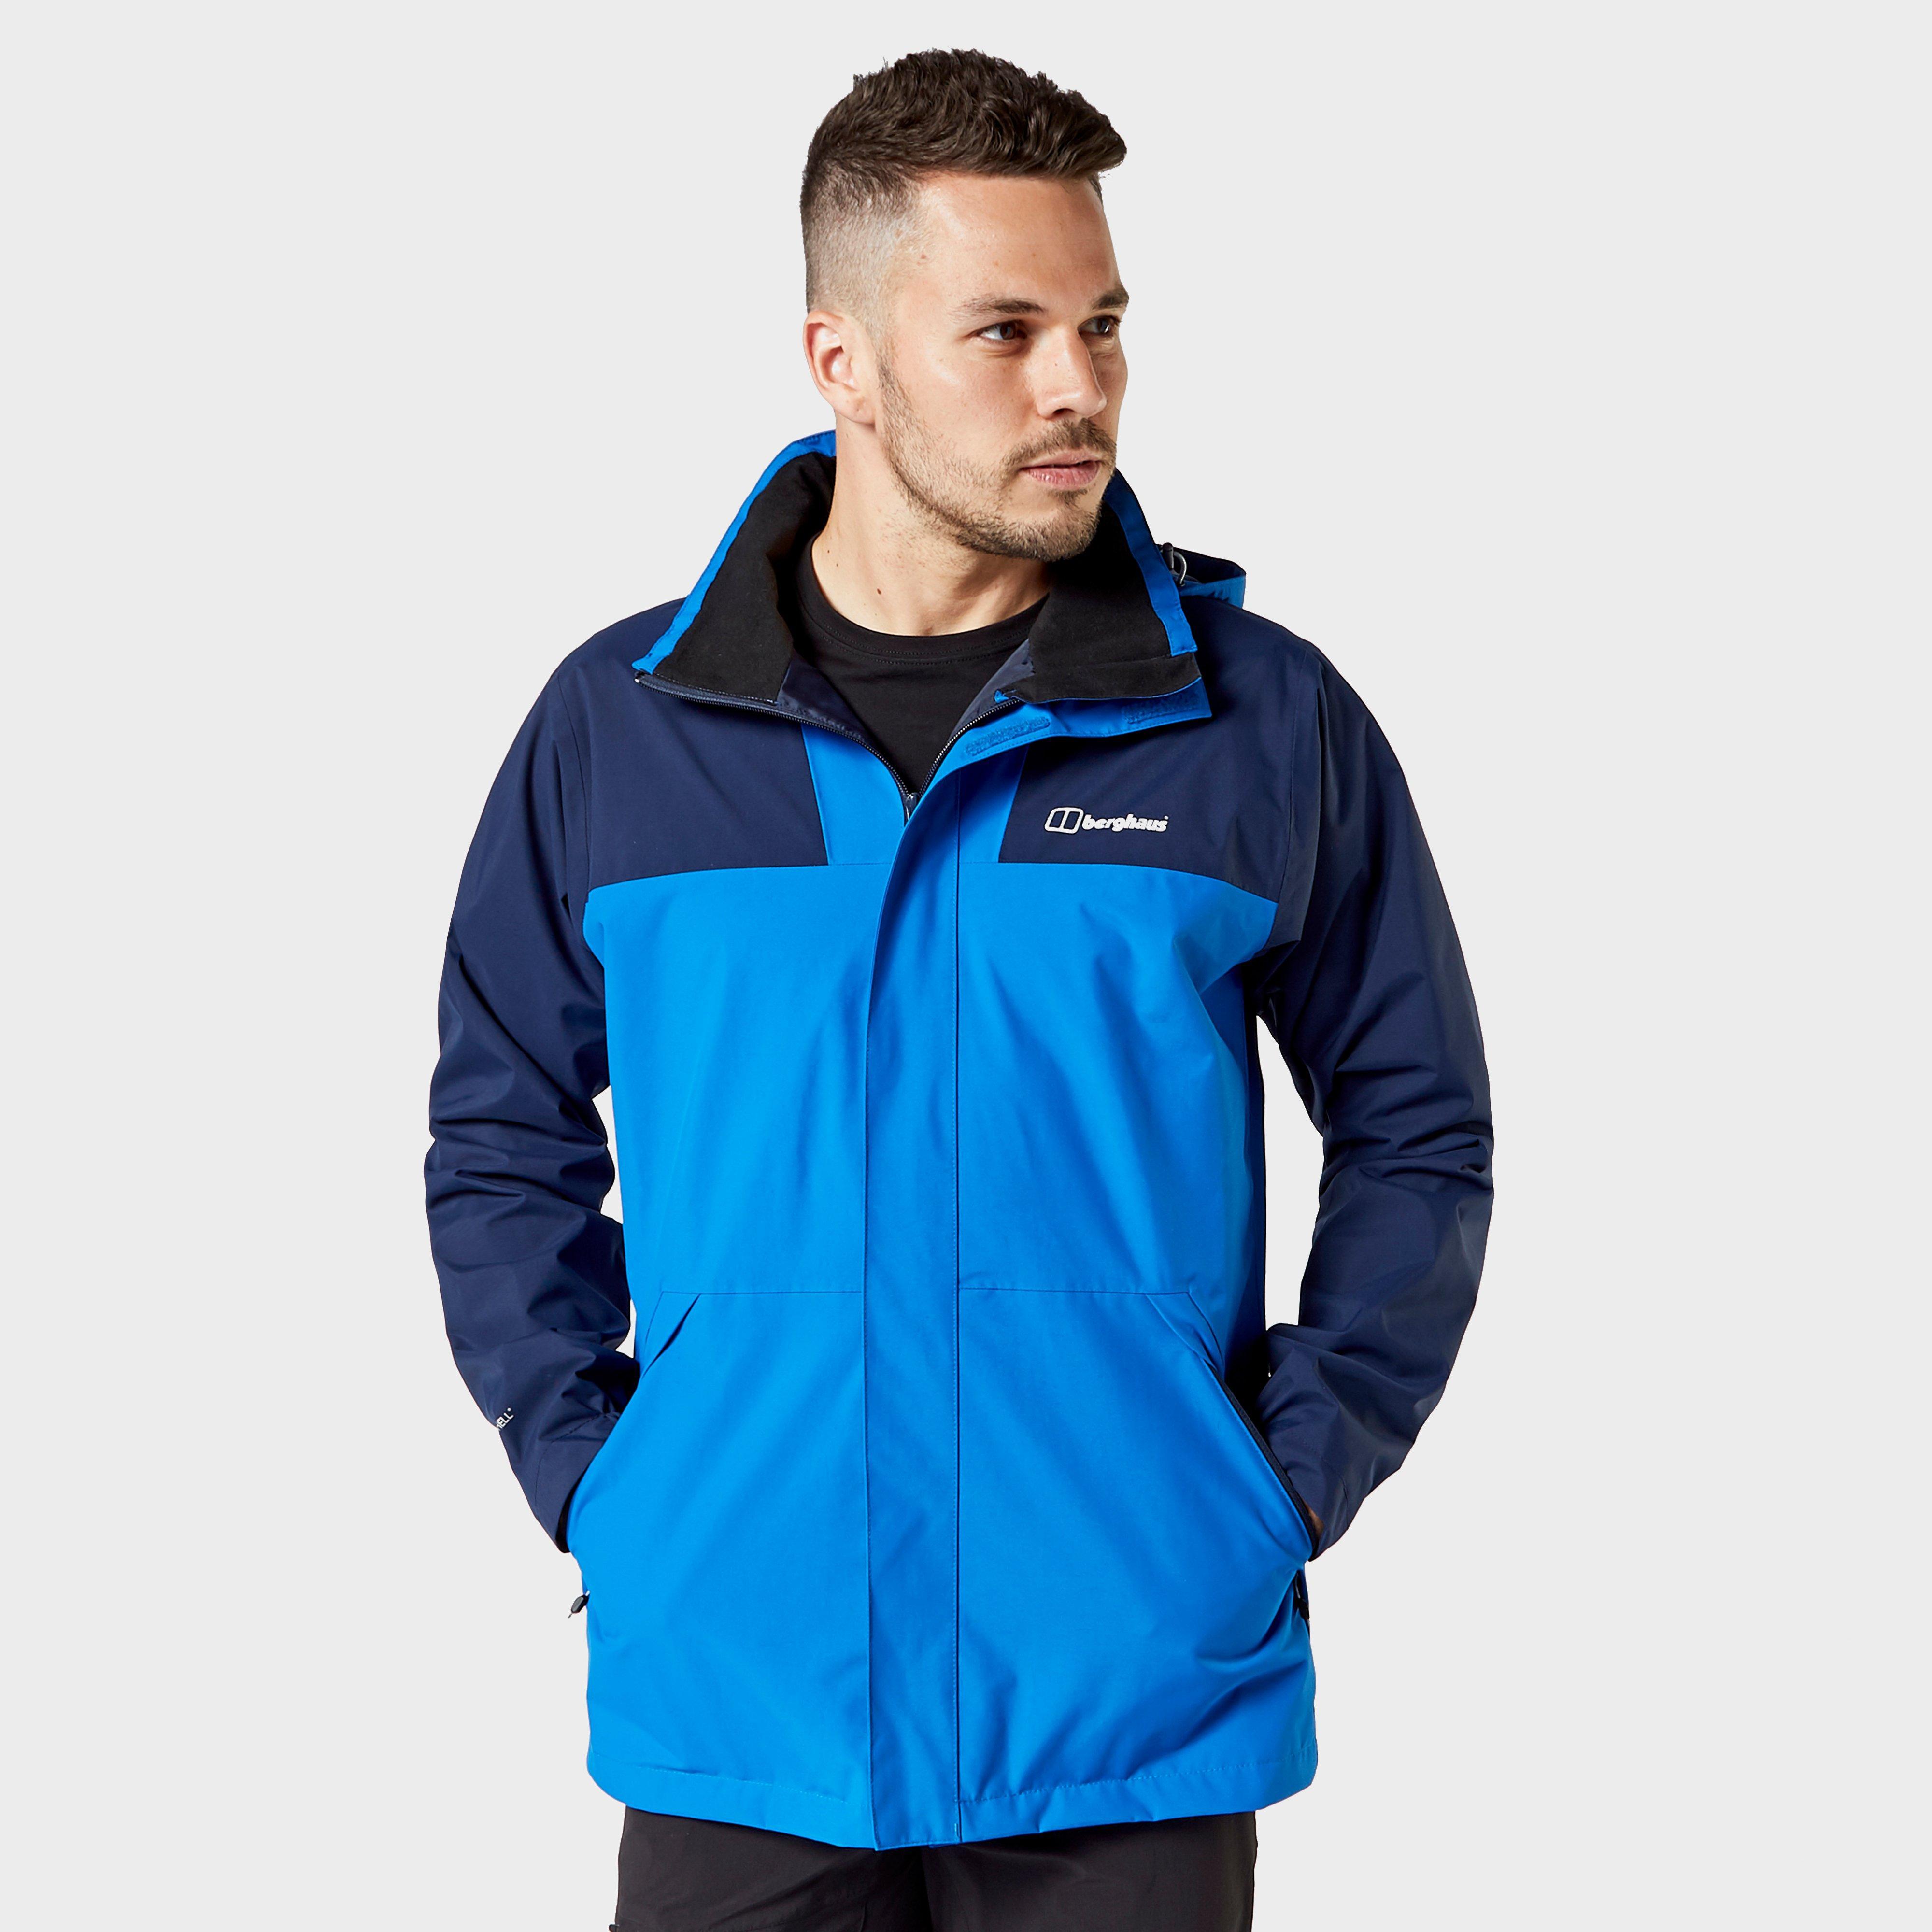 Berghaus Men's Kinglas Pro Jacket - Blue/Blu$, Blue